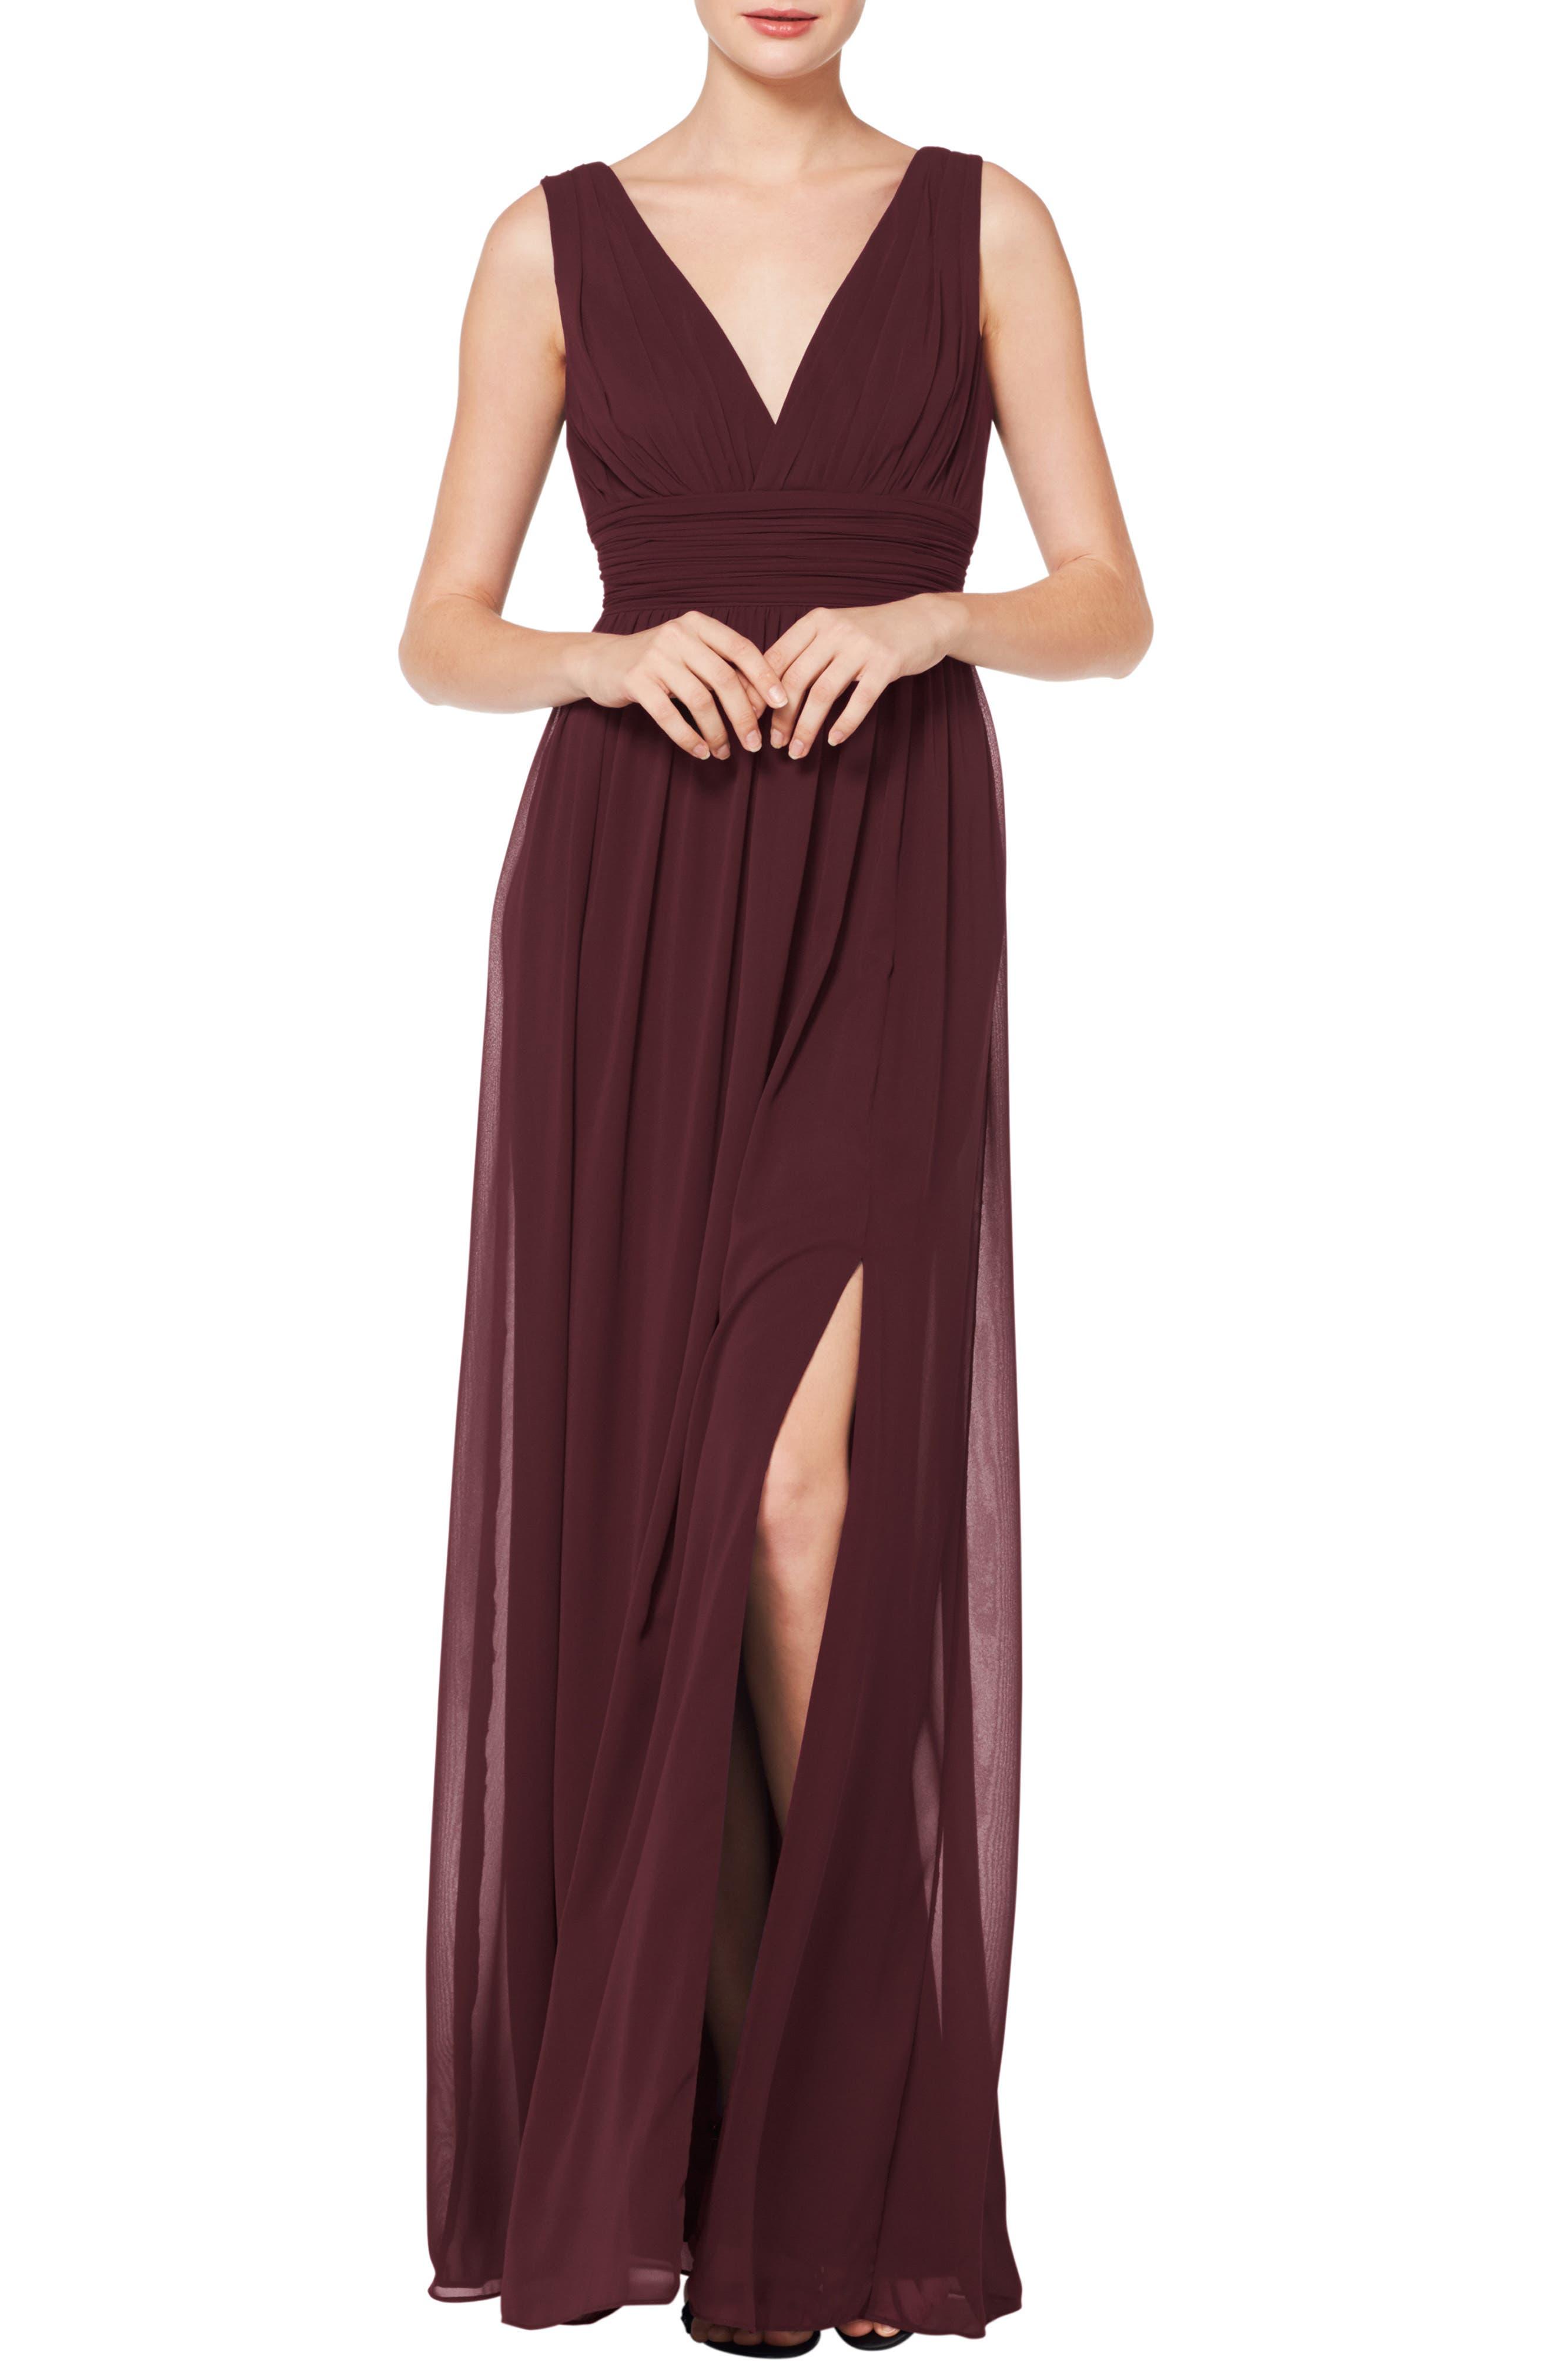 #levkoff V-Neck Pleated Chiffon Evening Dress, Burgundy